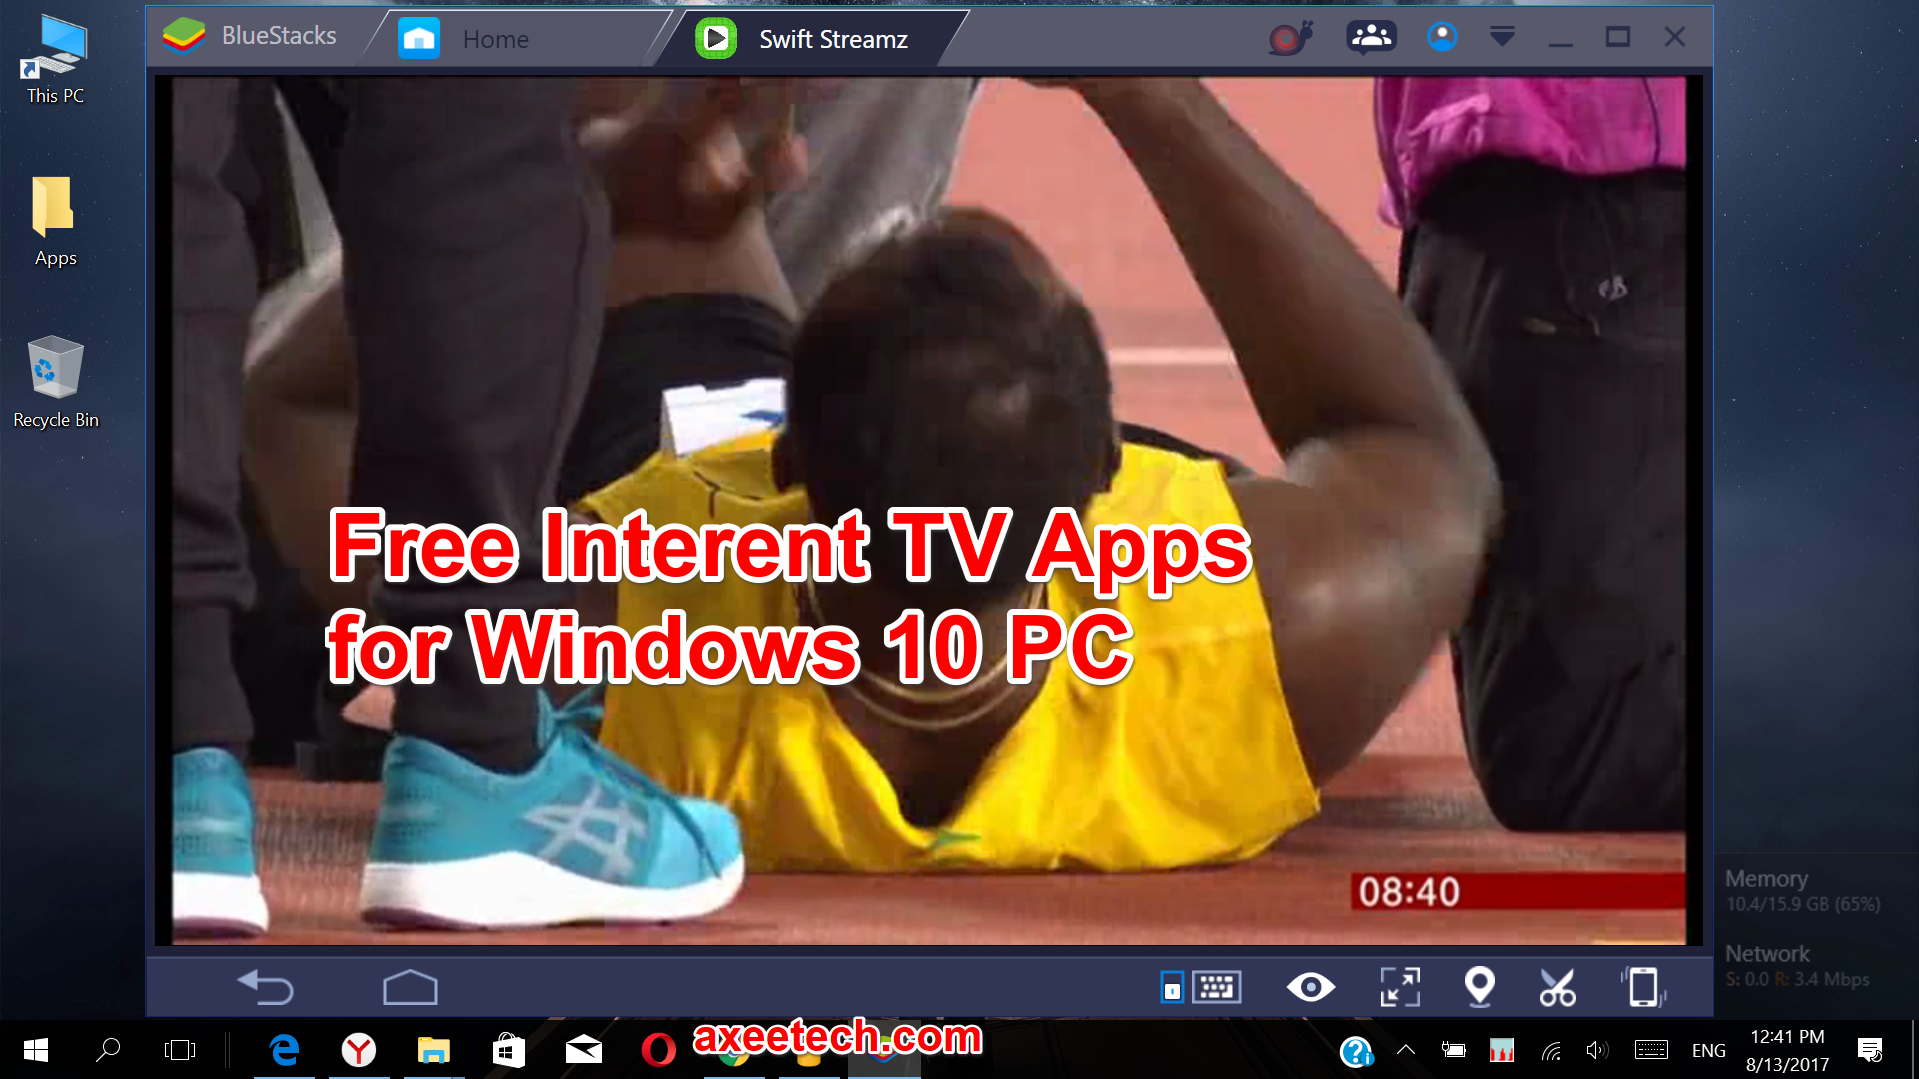 Free-nternet-tv-apps-Windows-10